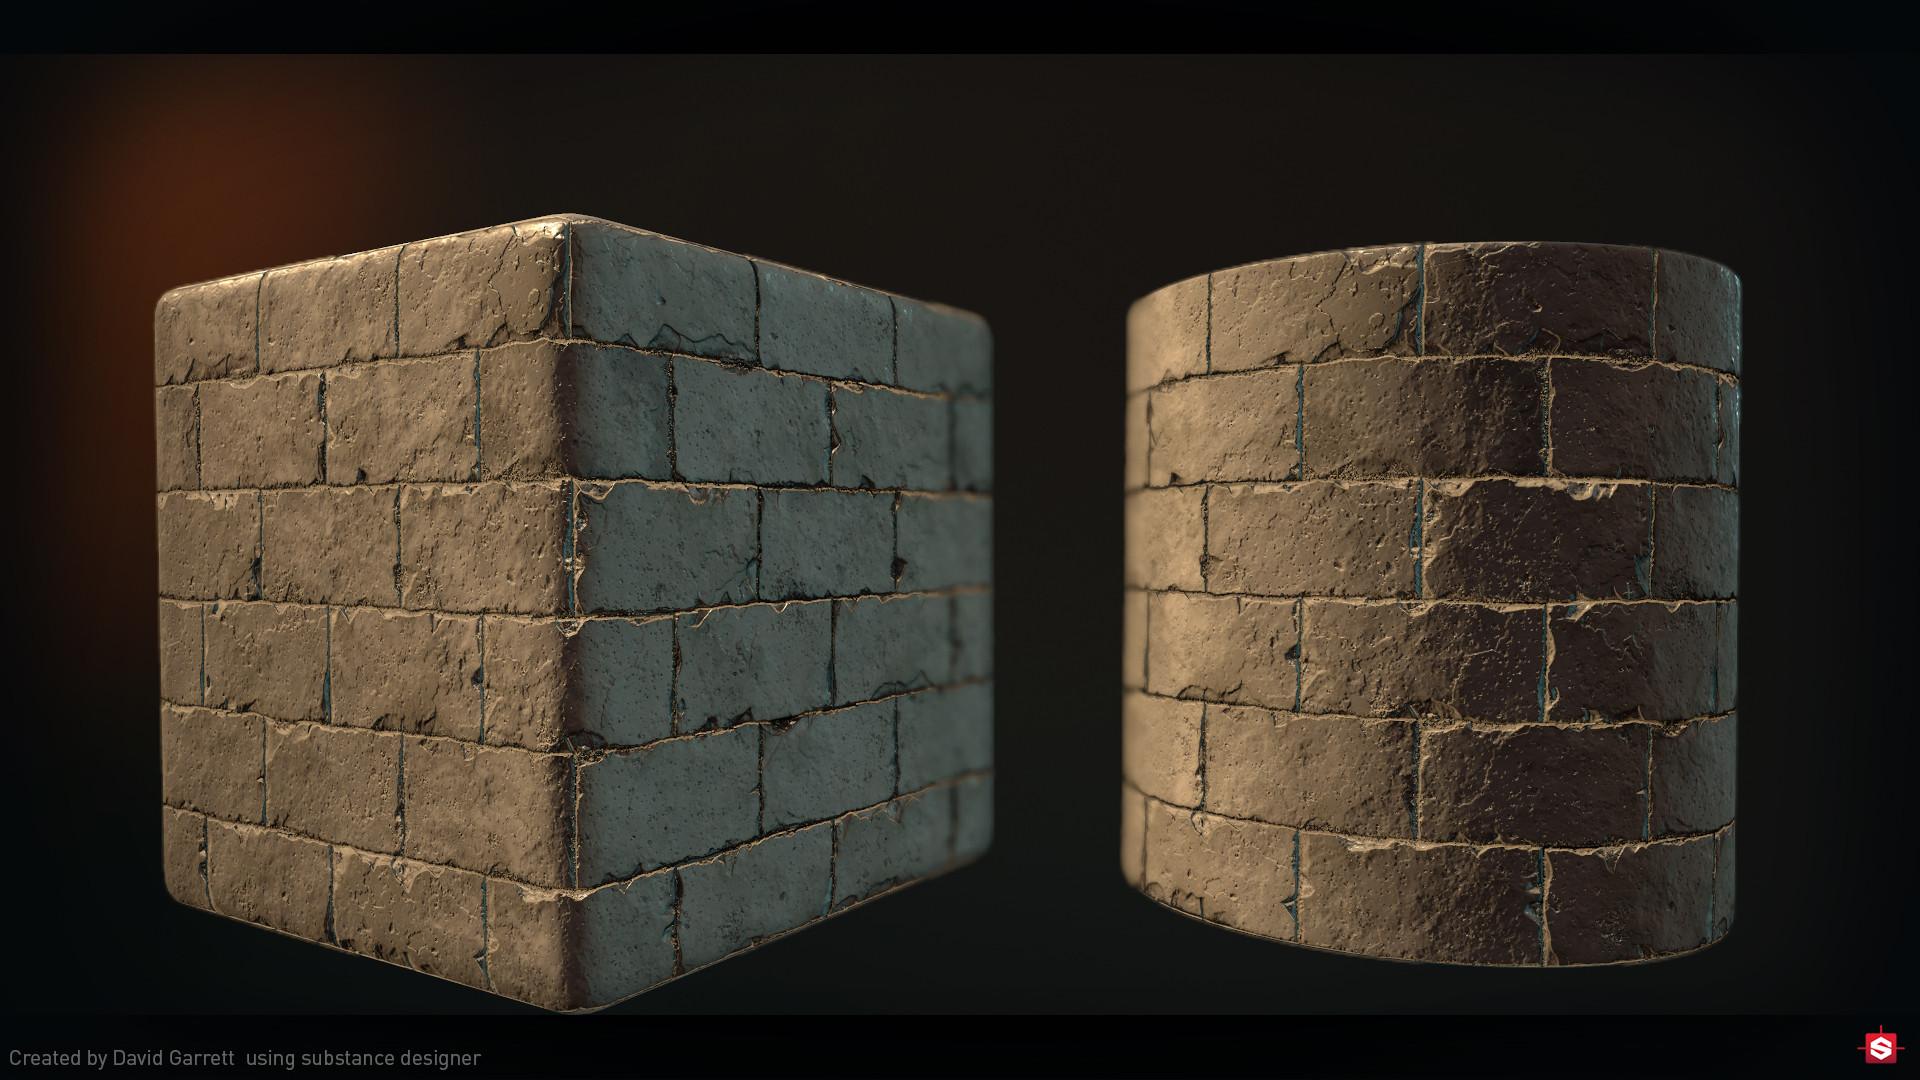 David garrett n3094311 asset shot material brick damaged